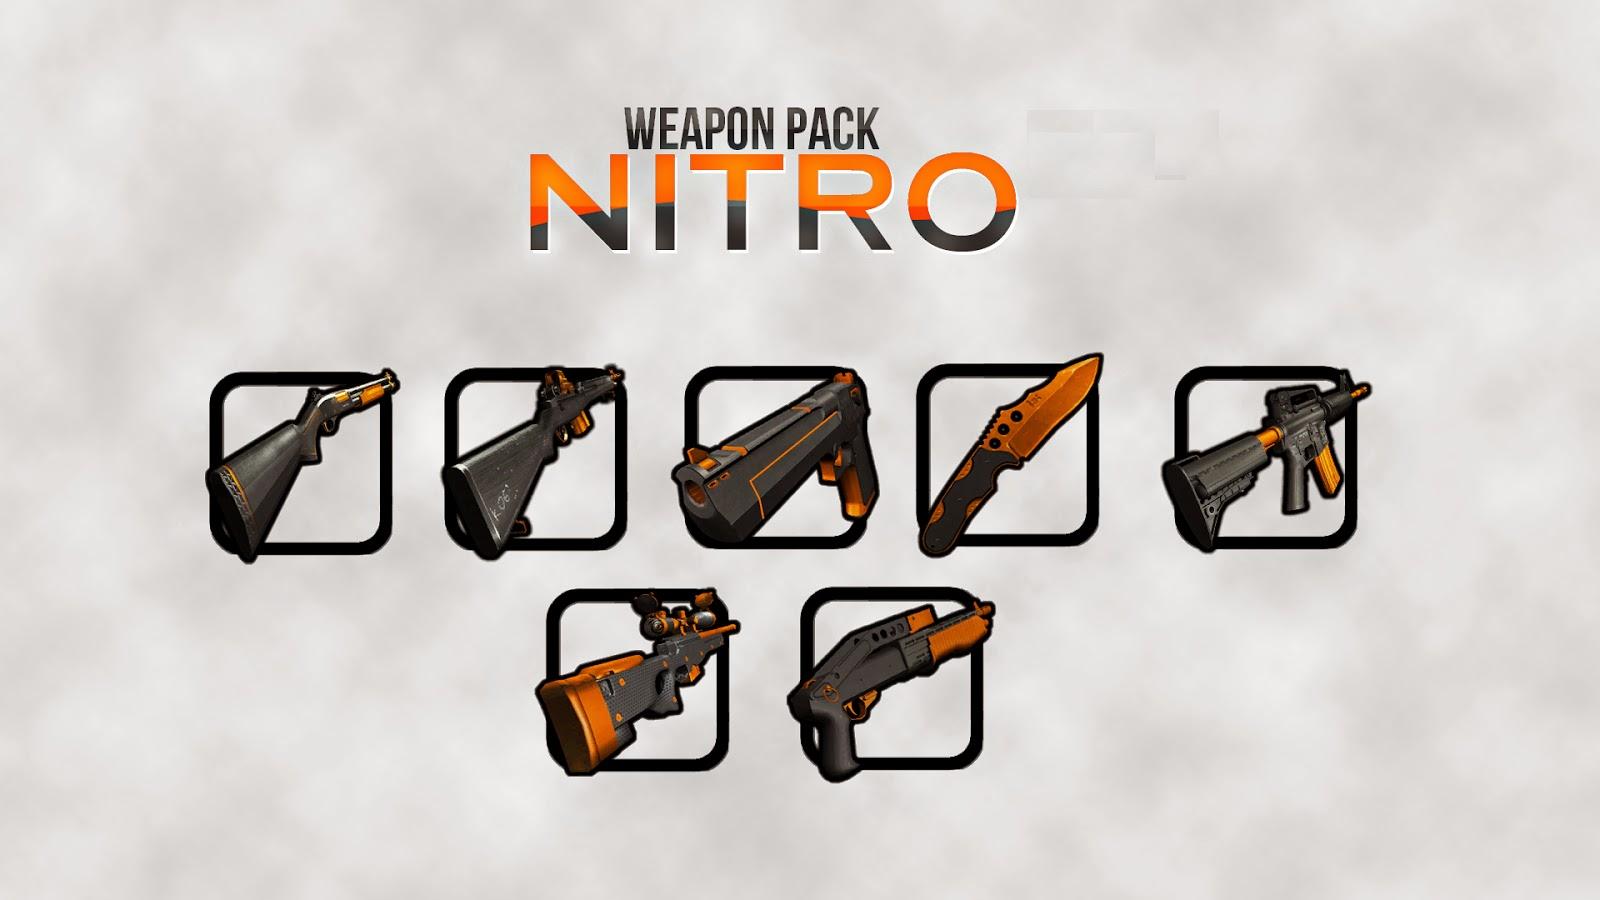 Weapon Pack Nitro Gta San Andreas 1